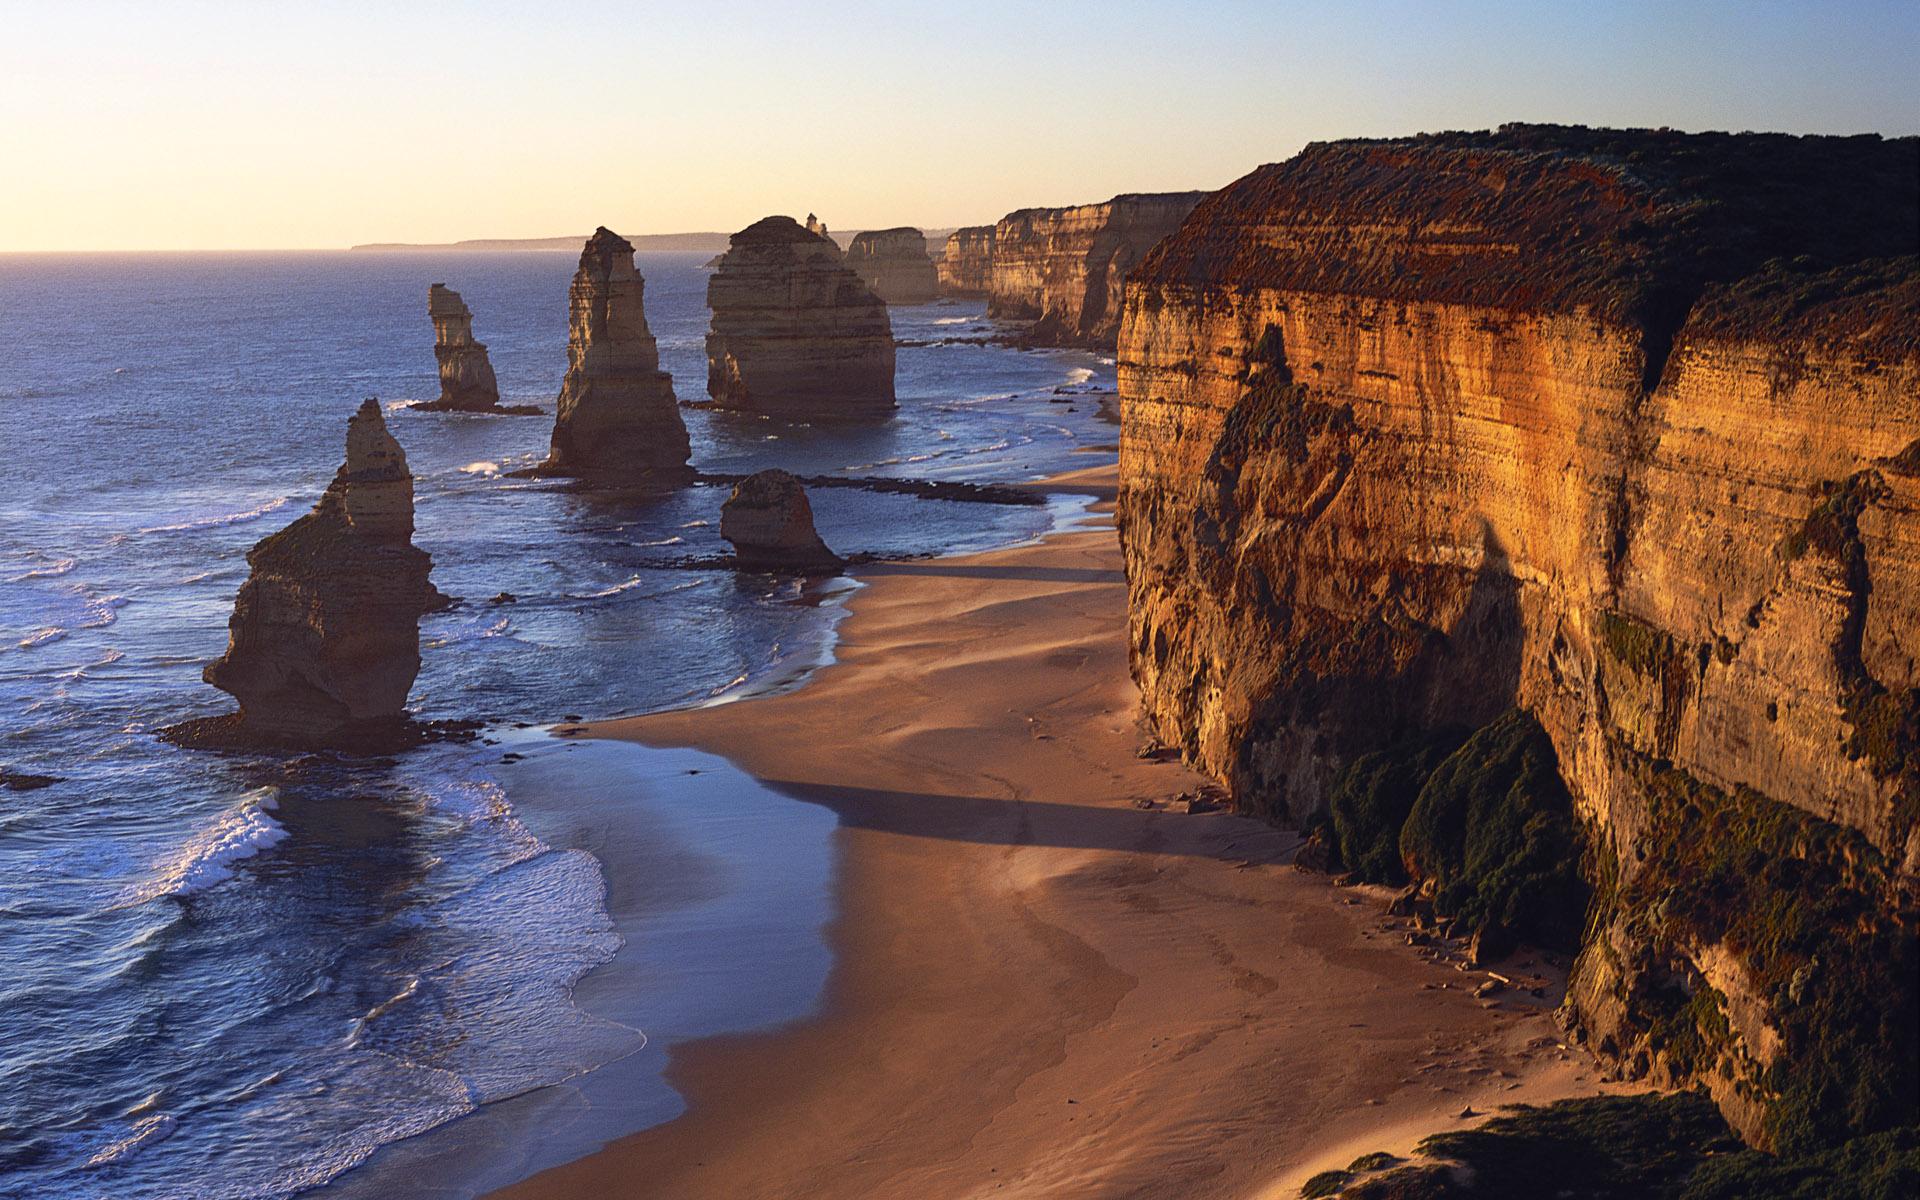 Australian pic photos 21